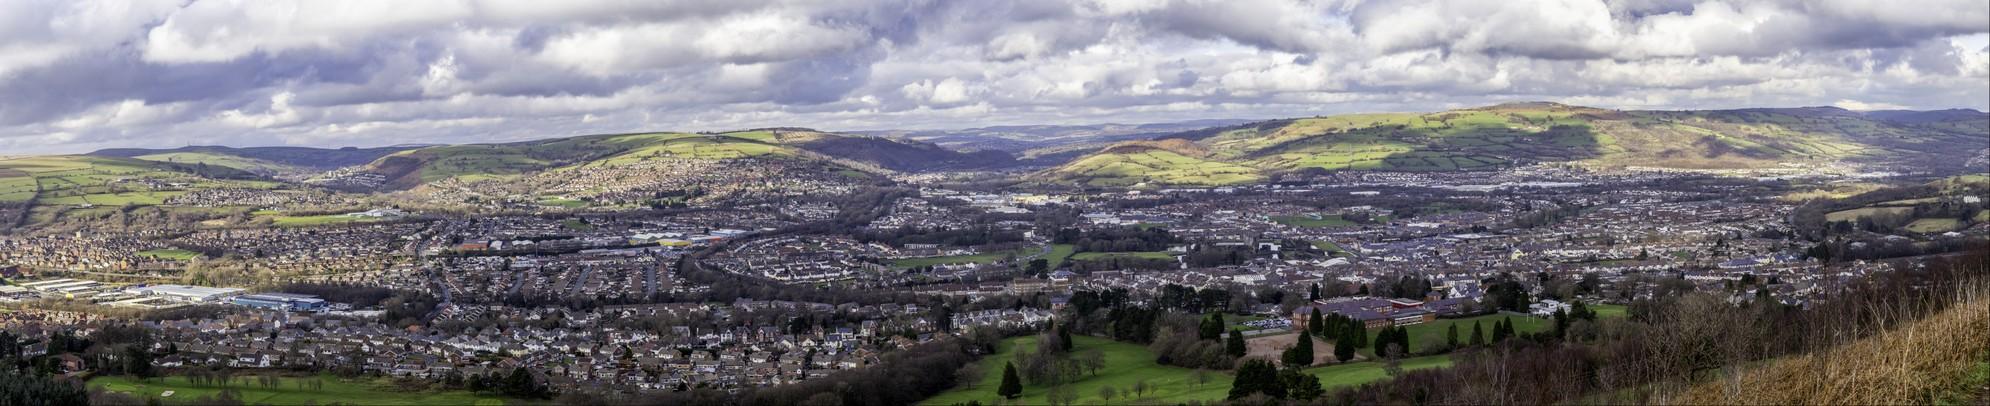 Caerphilly Basin